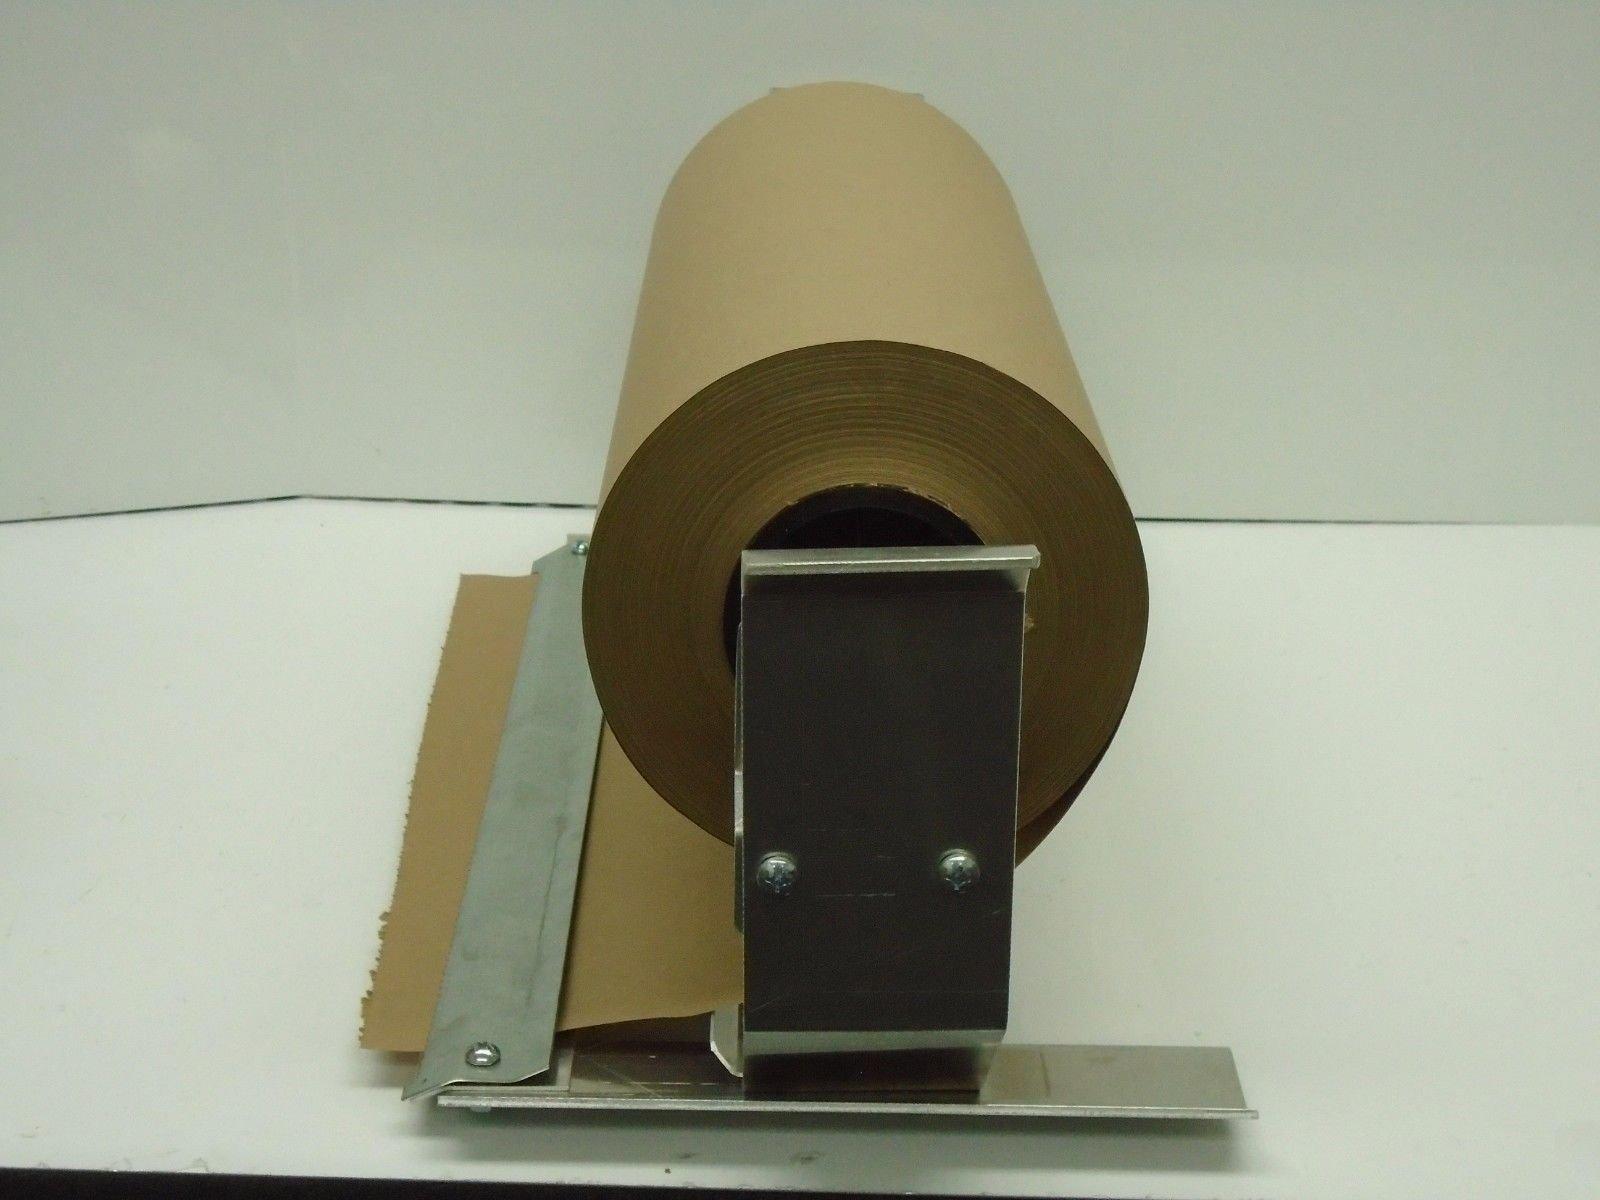 Paper Cutter Roll Dispenser Econoline 18 inches table mount Kraft paper Duralov by Duralov (Image #5)